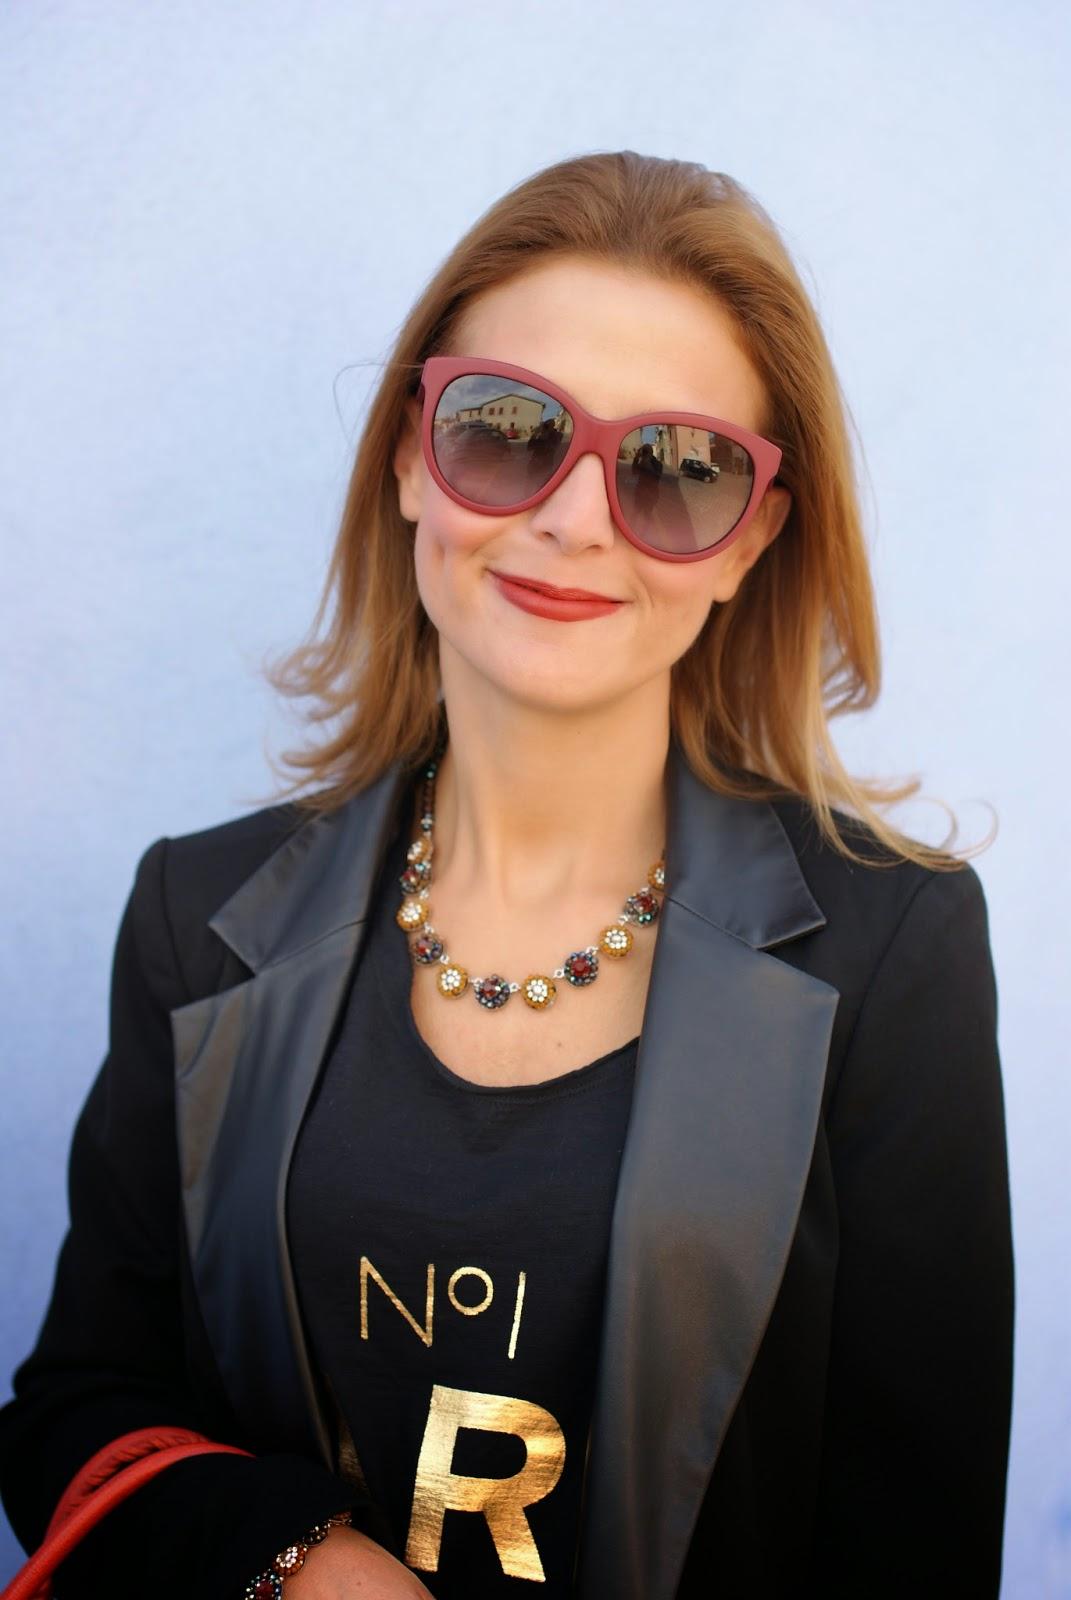 Sodini bijoux new fall winter collection, Bryant Park collection by Sodini, MAC chili lipstick, Balenciaga bag rouge ambre, Fashion and Cookies, fashion blogger